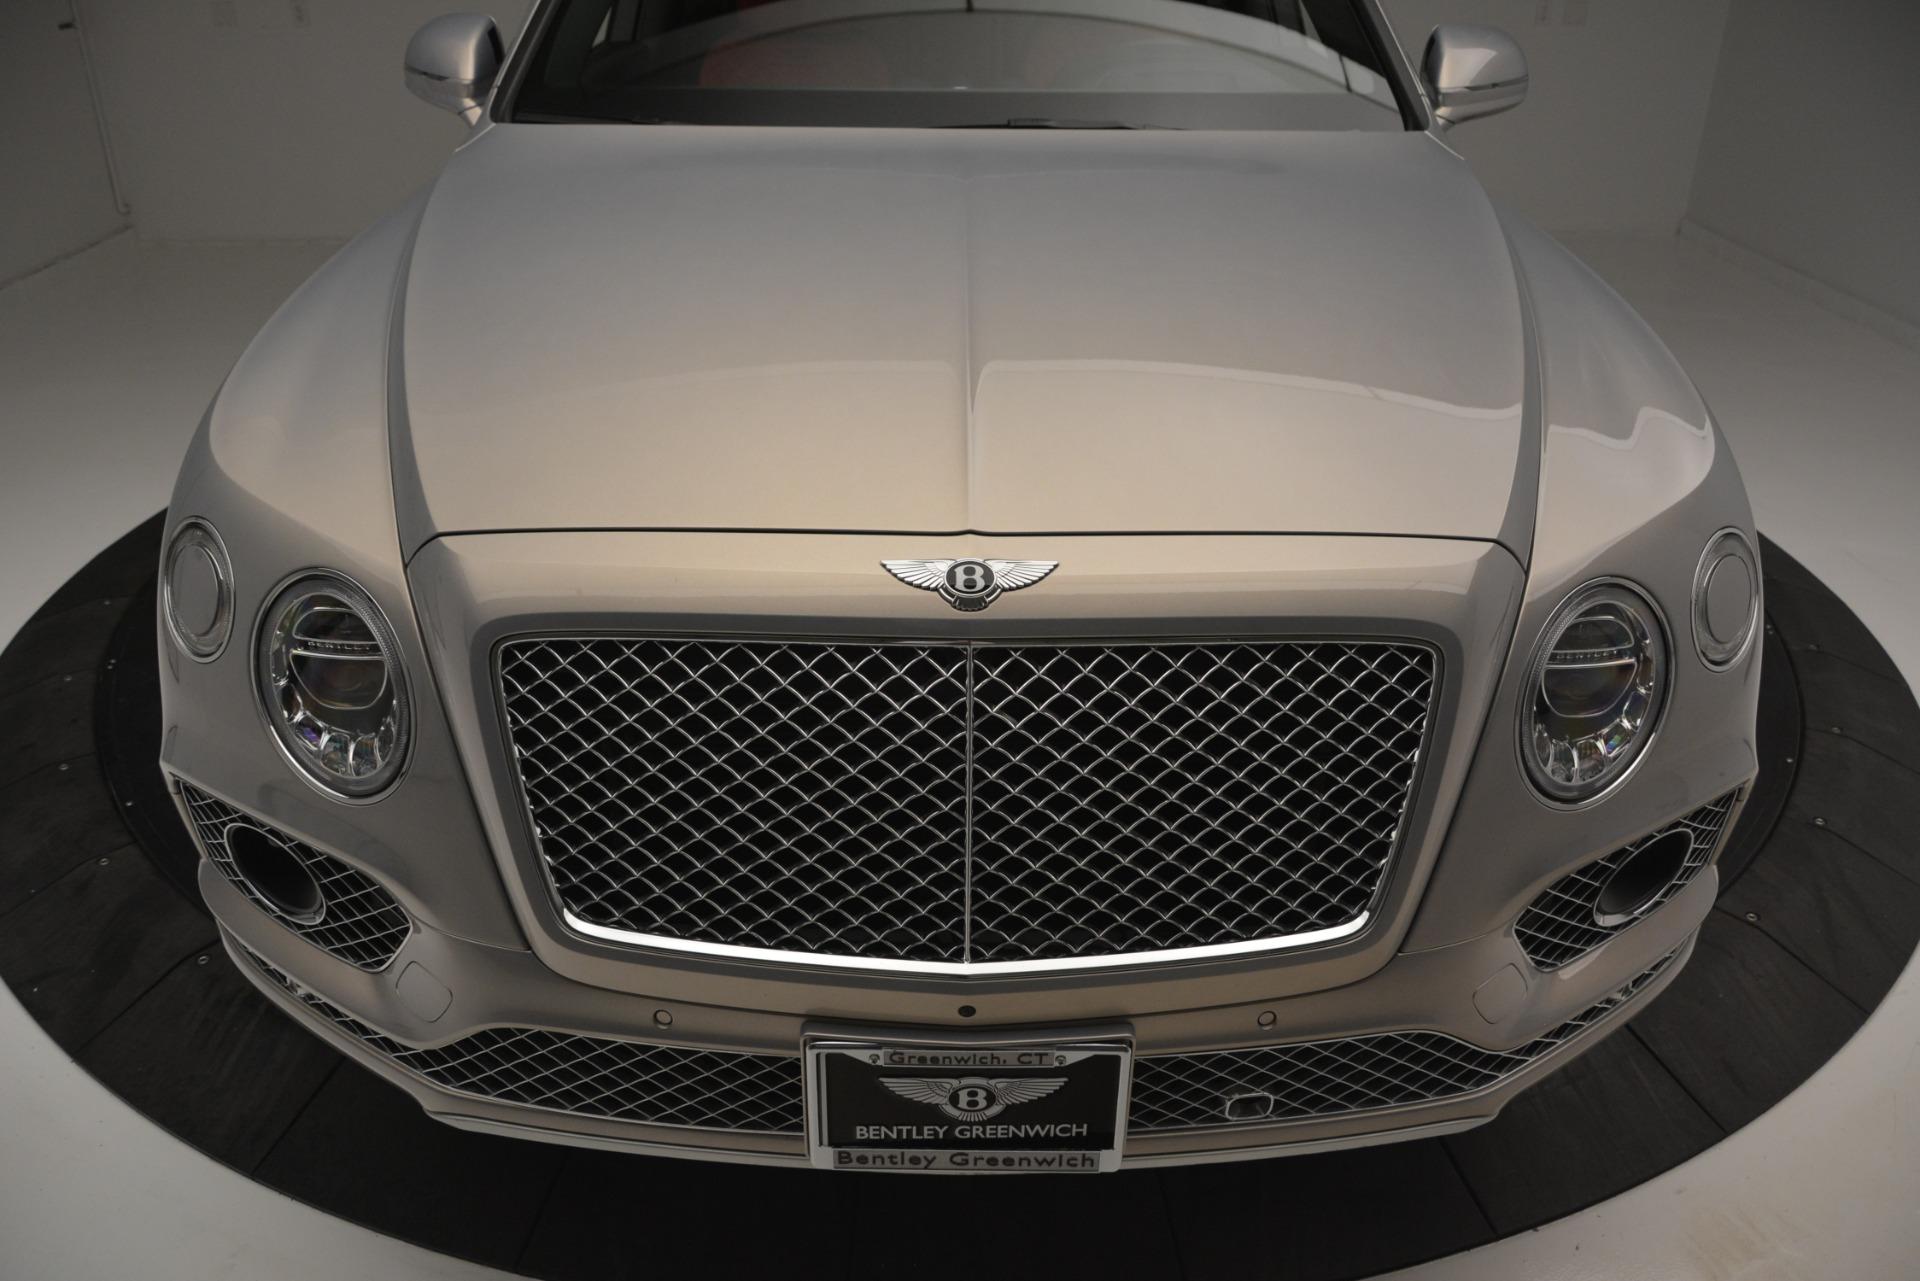 Used 2017 Bentley Bentayga W12 For Sale In Greenwich, CT. Alfa Romeo of Greenwich, 7438 2641_p13